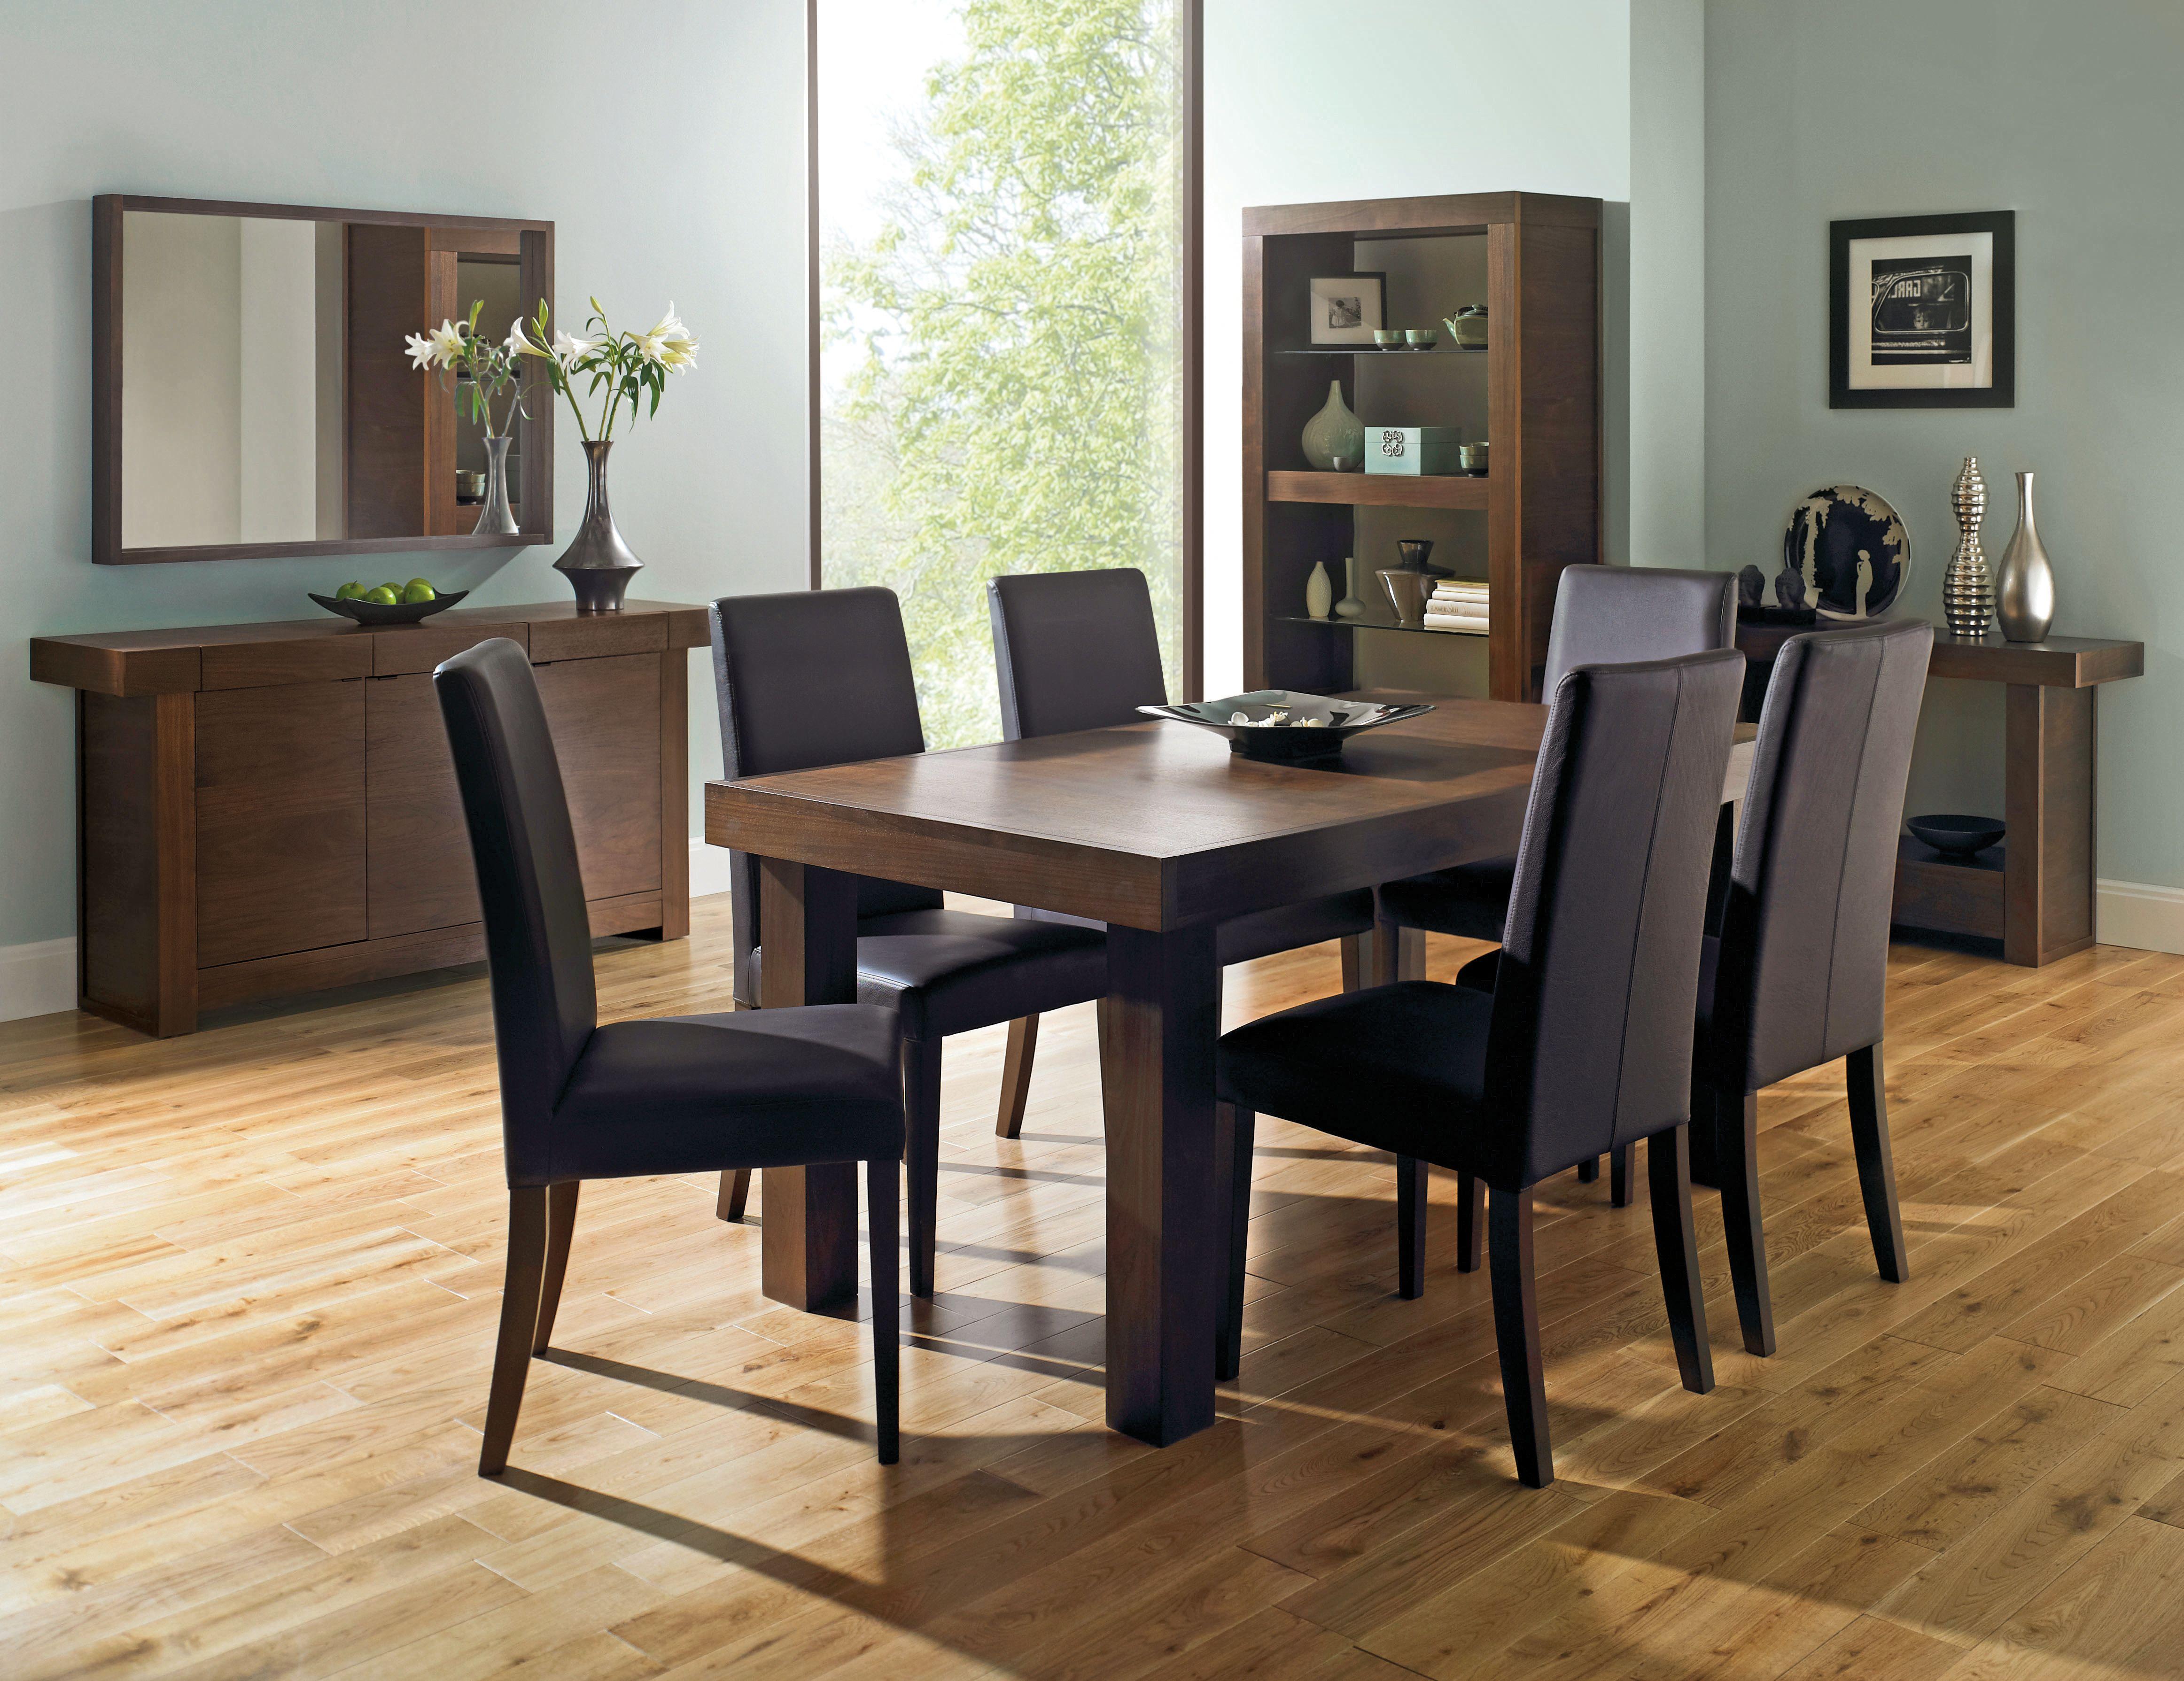 Akita Walnut 6 8 Seater Extending Dining Table